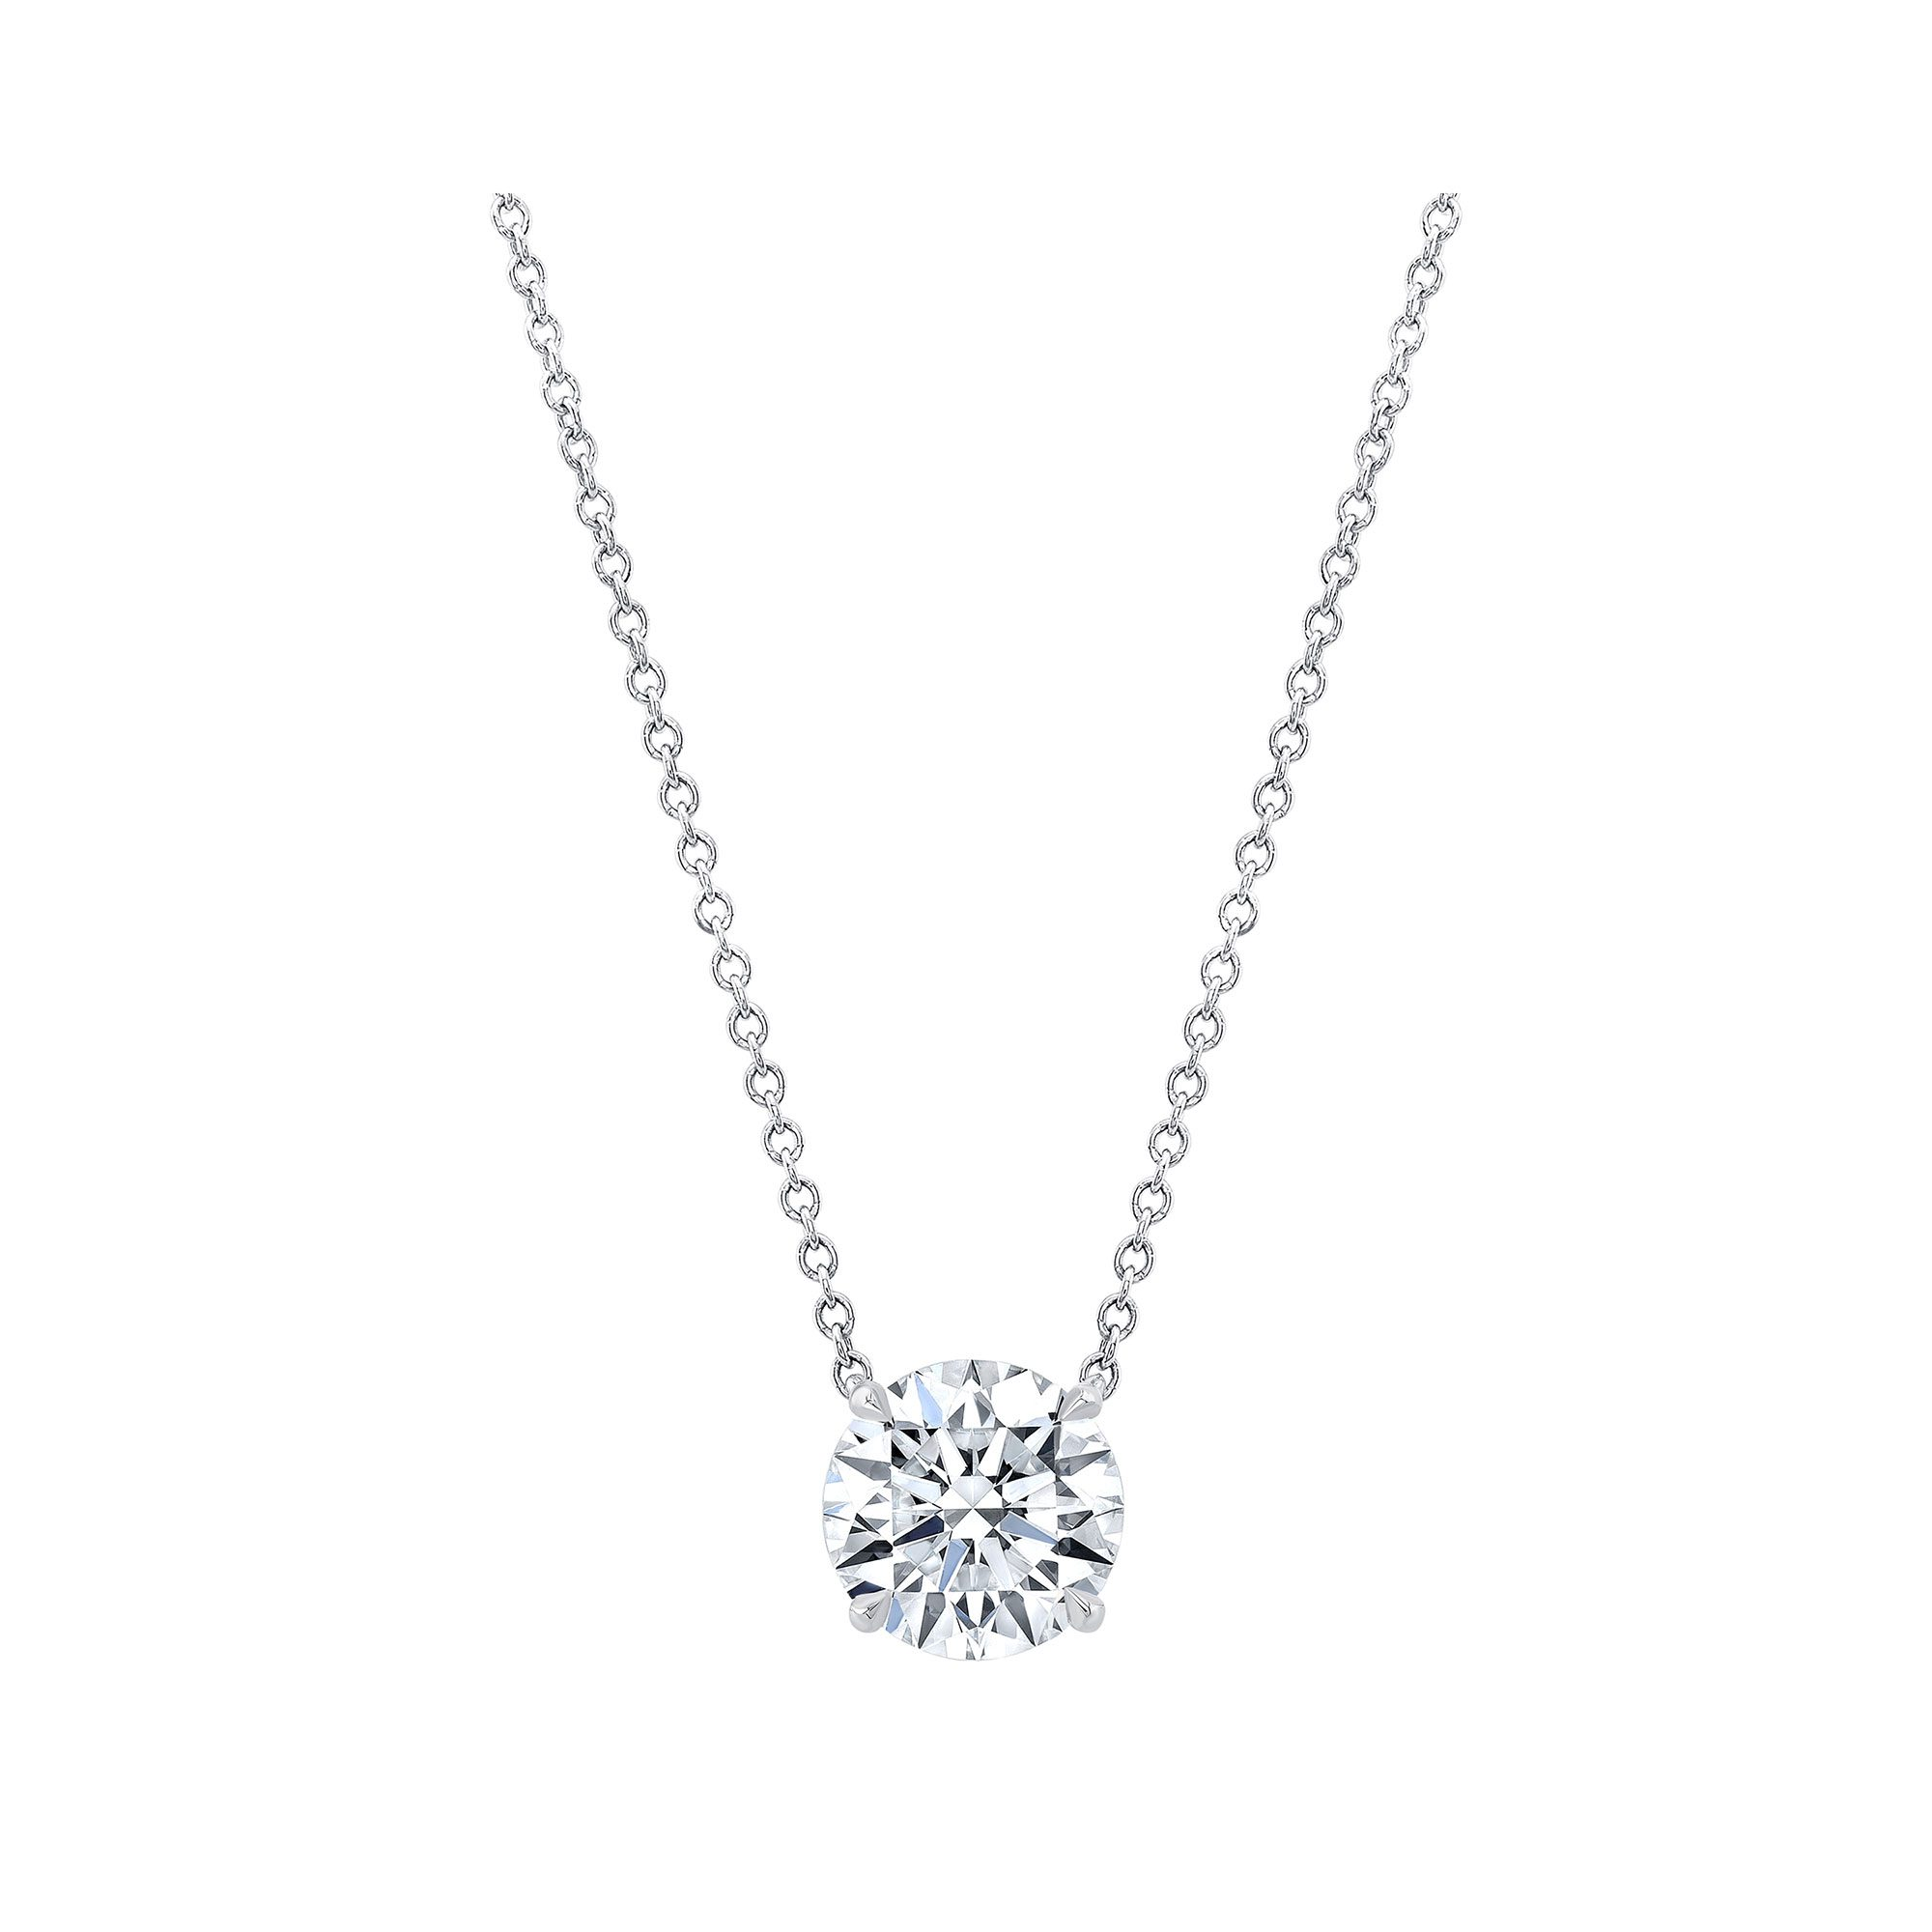 Marie Round Brilliant 2.5 Carat Lab Grown Diamond Necklace Pendant in White Gold